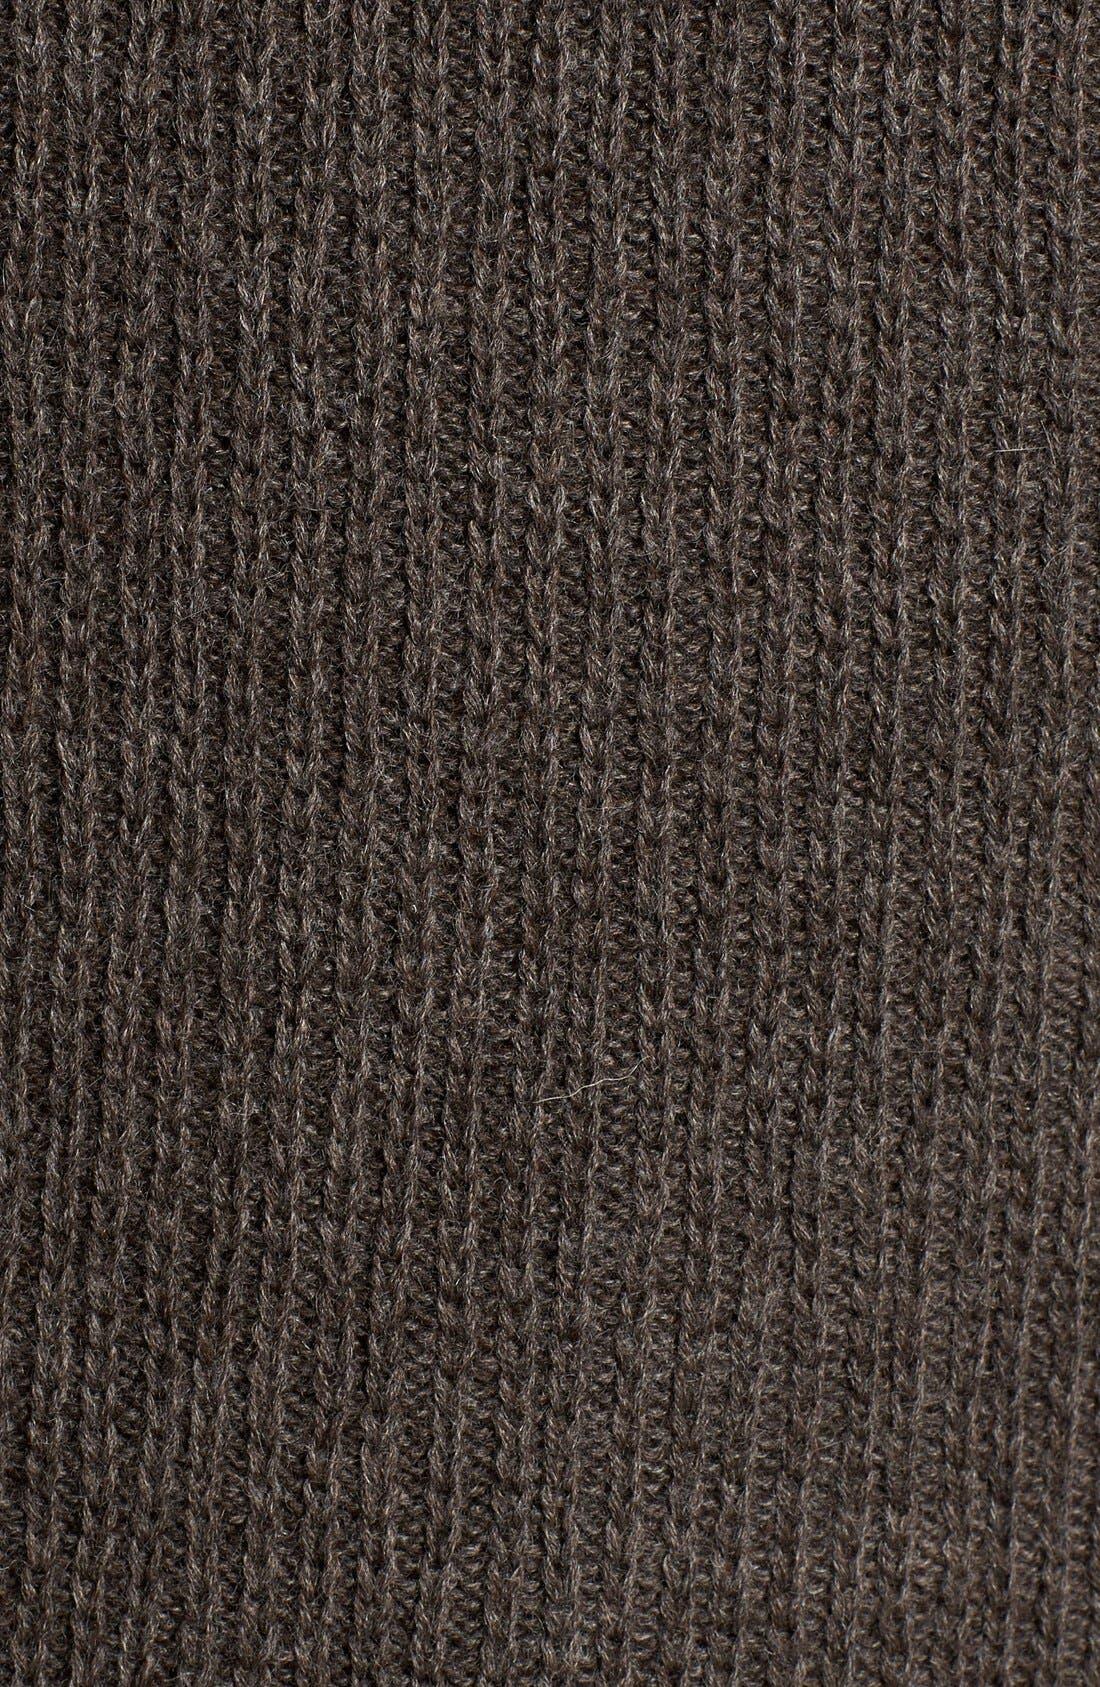 'Huka Lodge' Merino Wool Blend Quarter Zip Sweater,                             Alternate thumbnail 5, color,                             Dirt